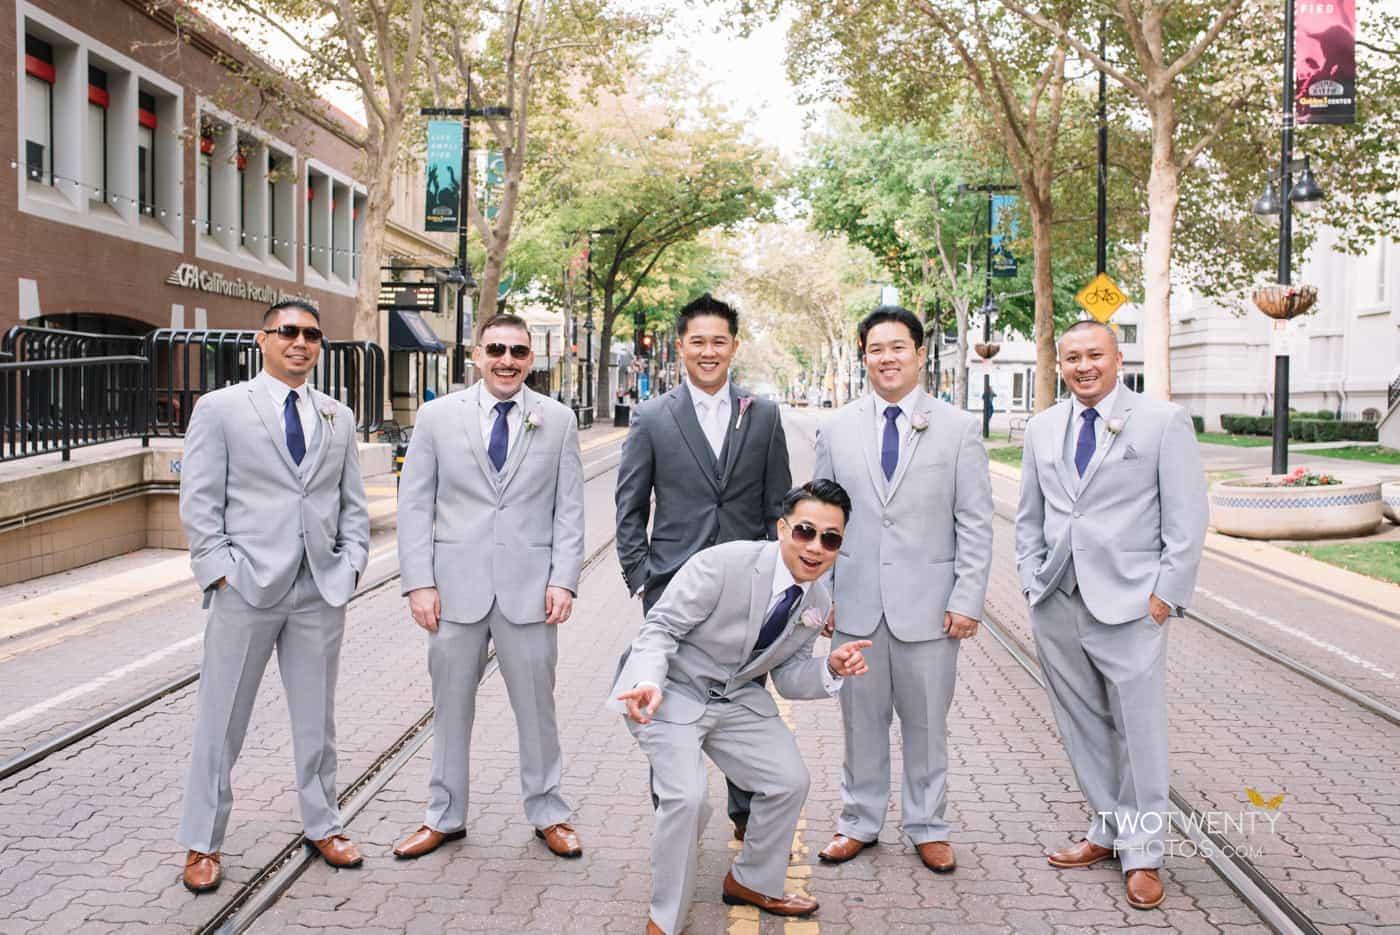 hyatt-regency-downtown-sacramento-wedding-photographer-29